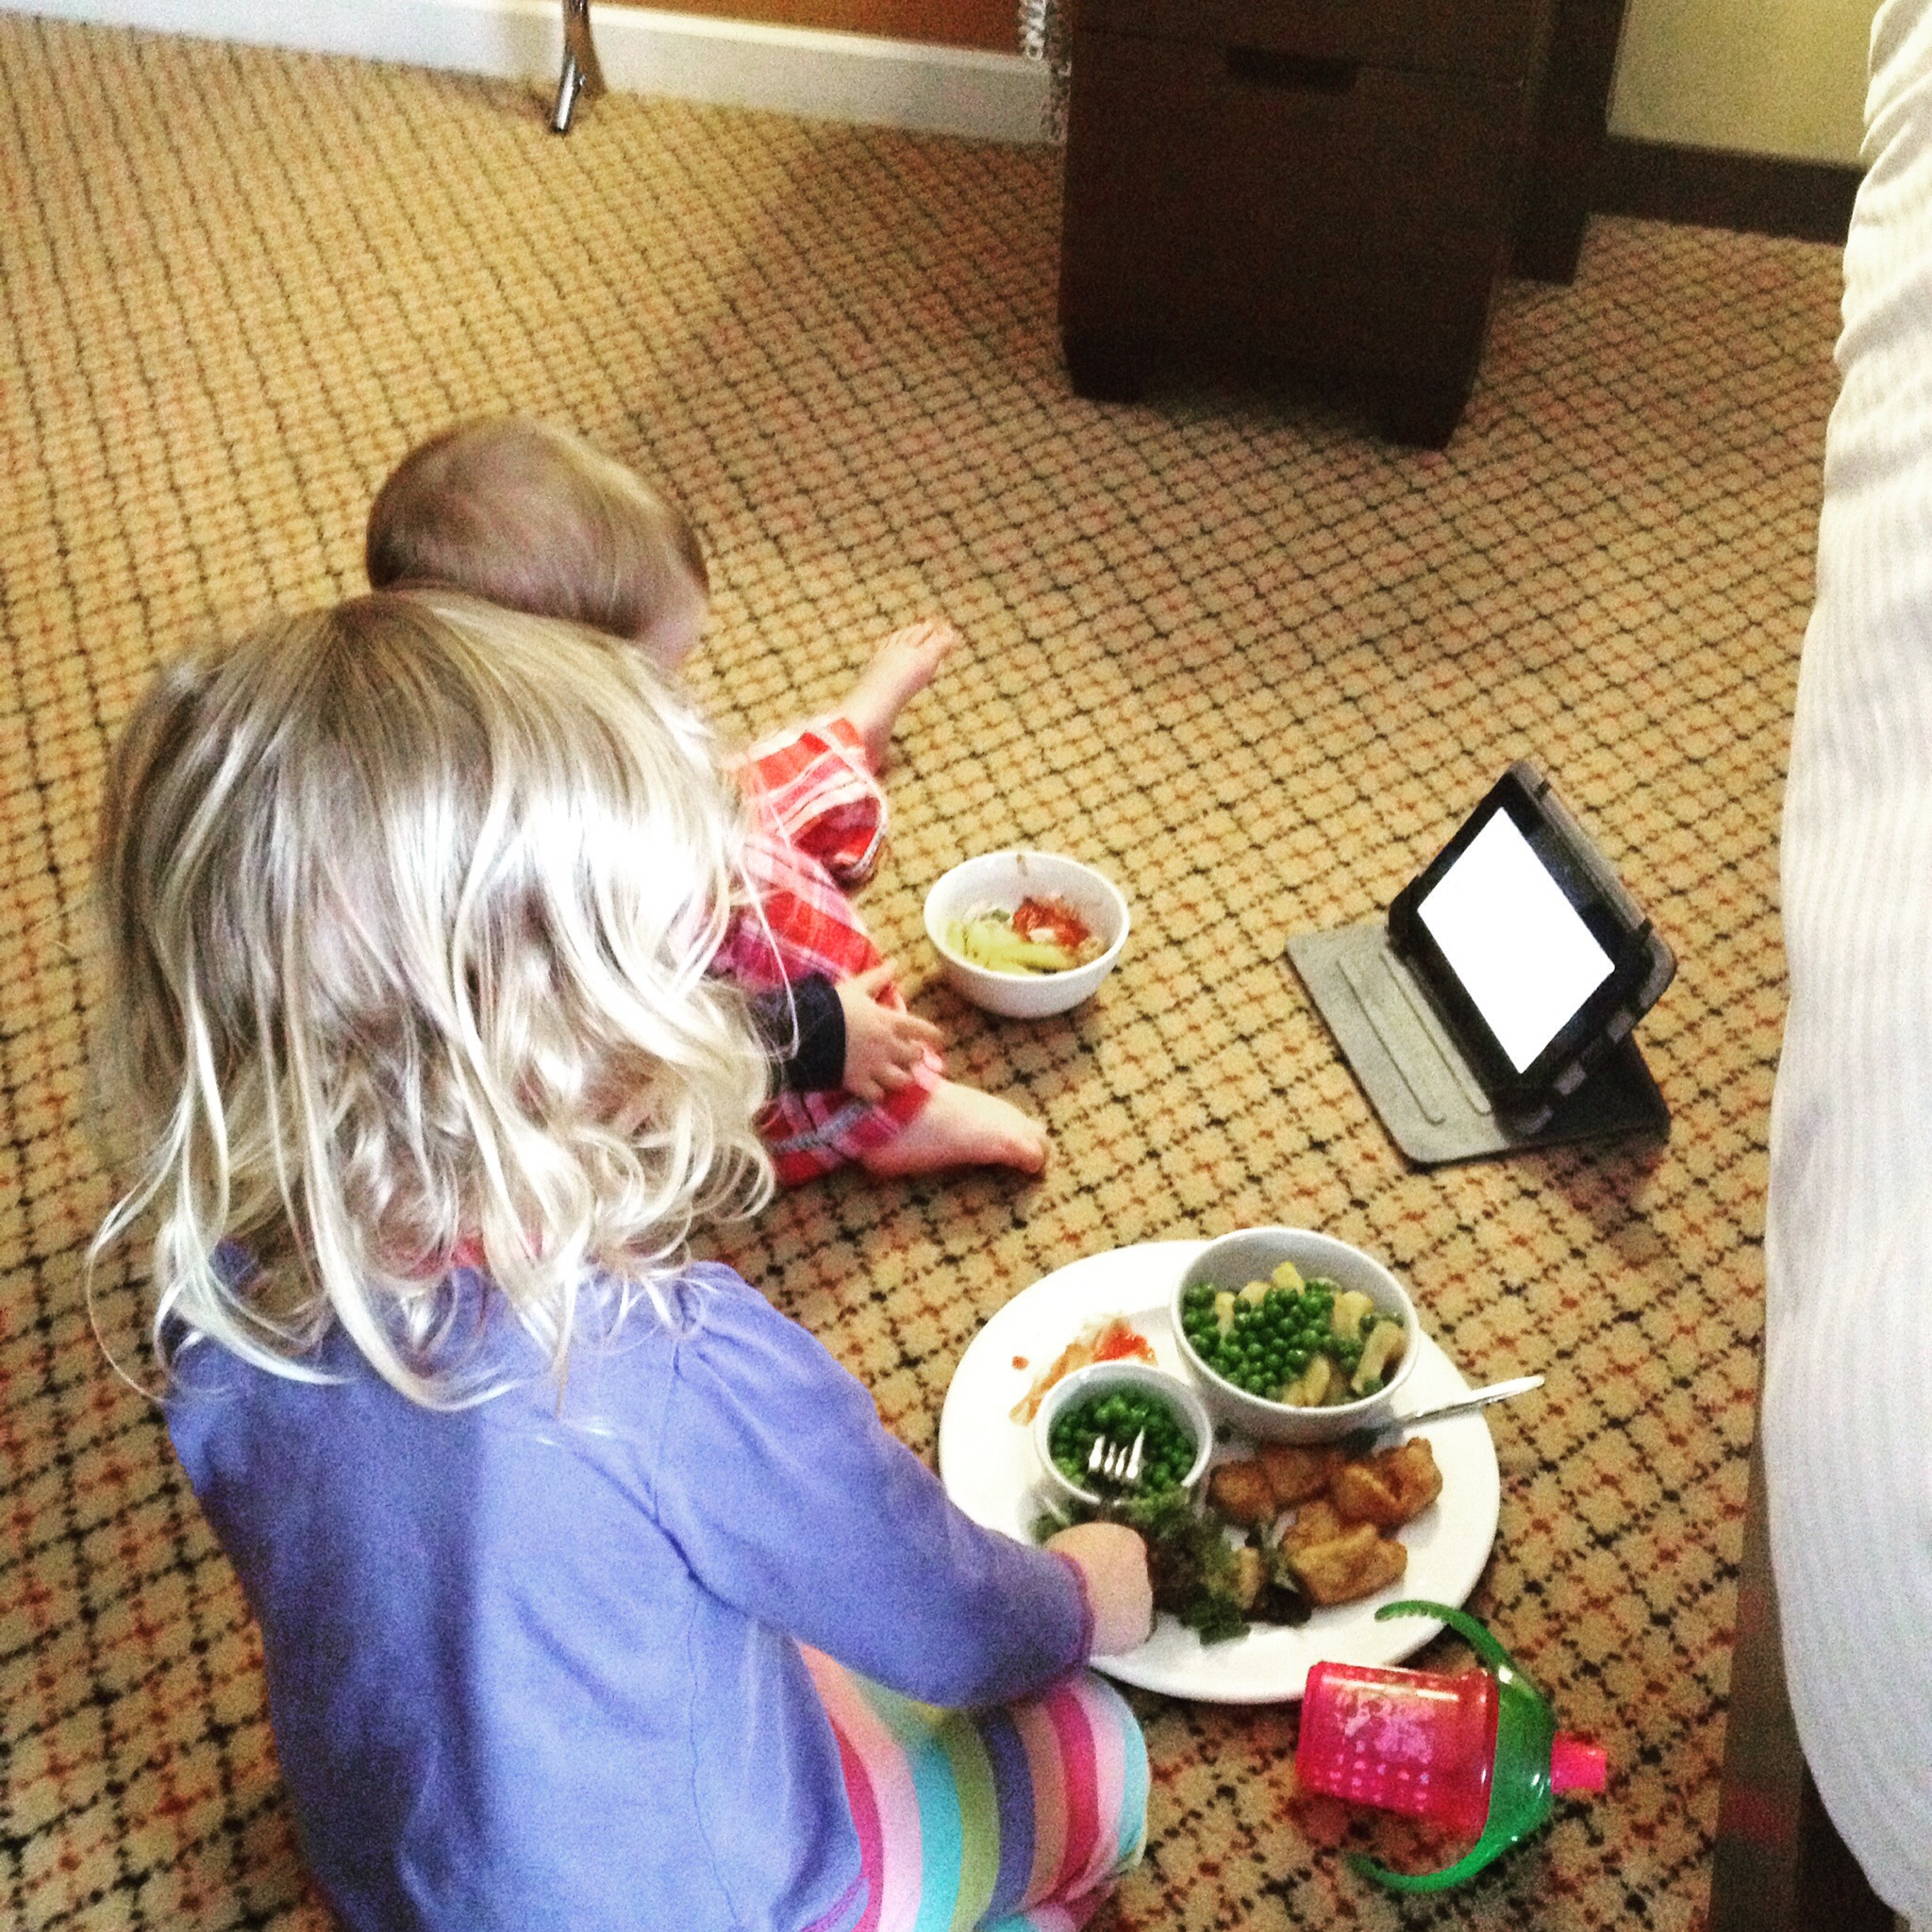 Room service hilton